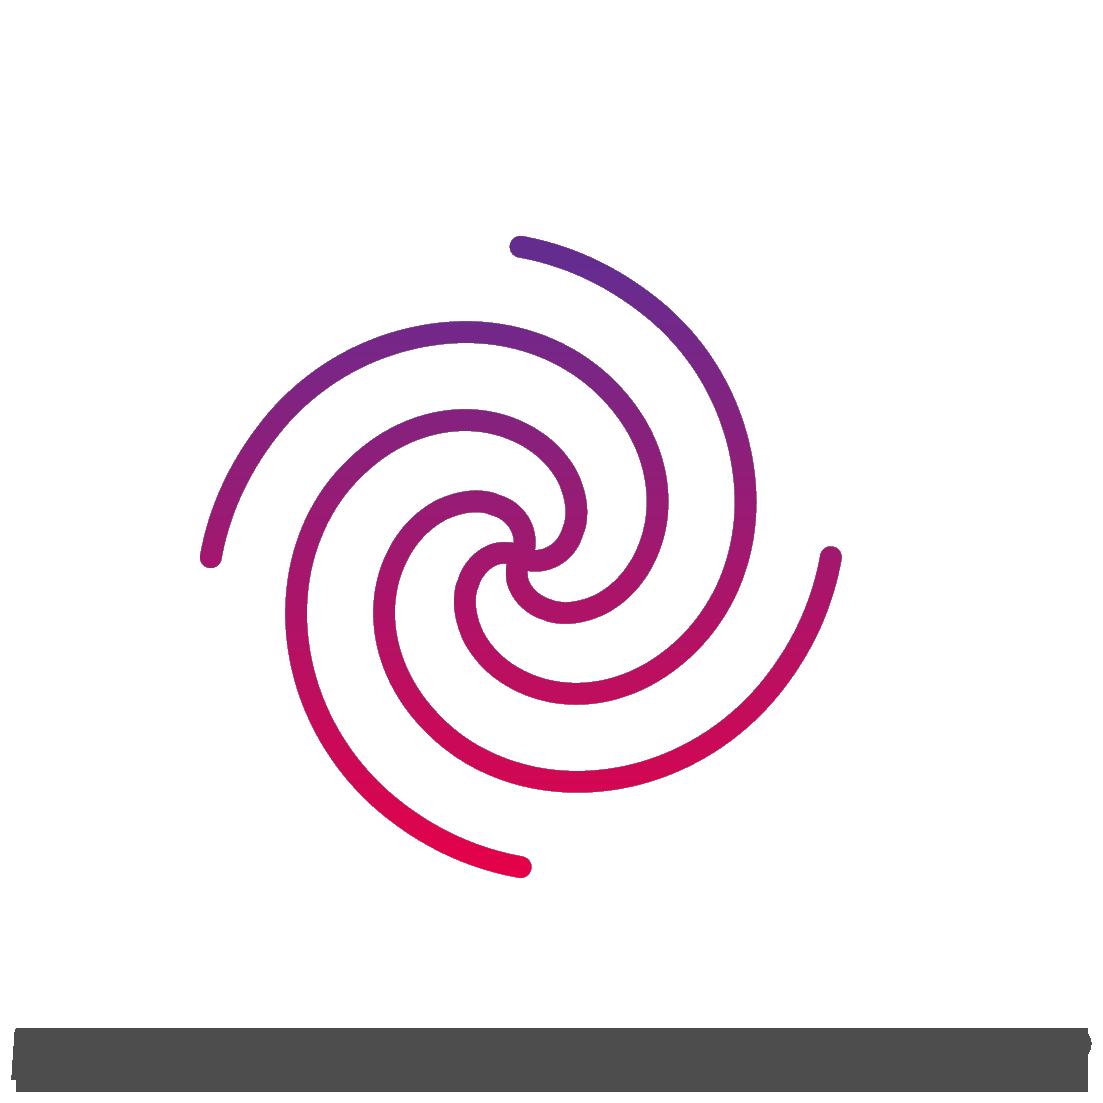 группа компаний МЕТЕОСПЕЦПРИБОР